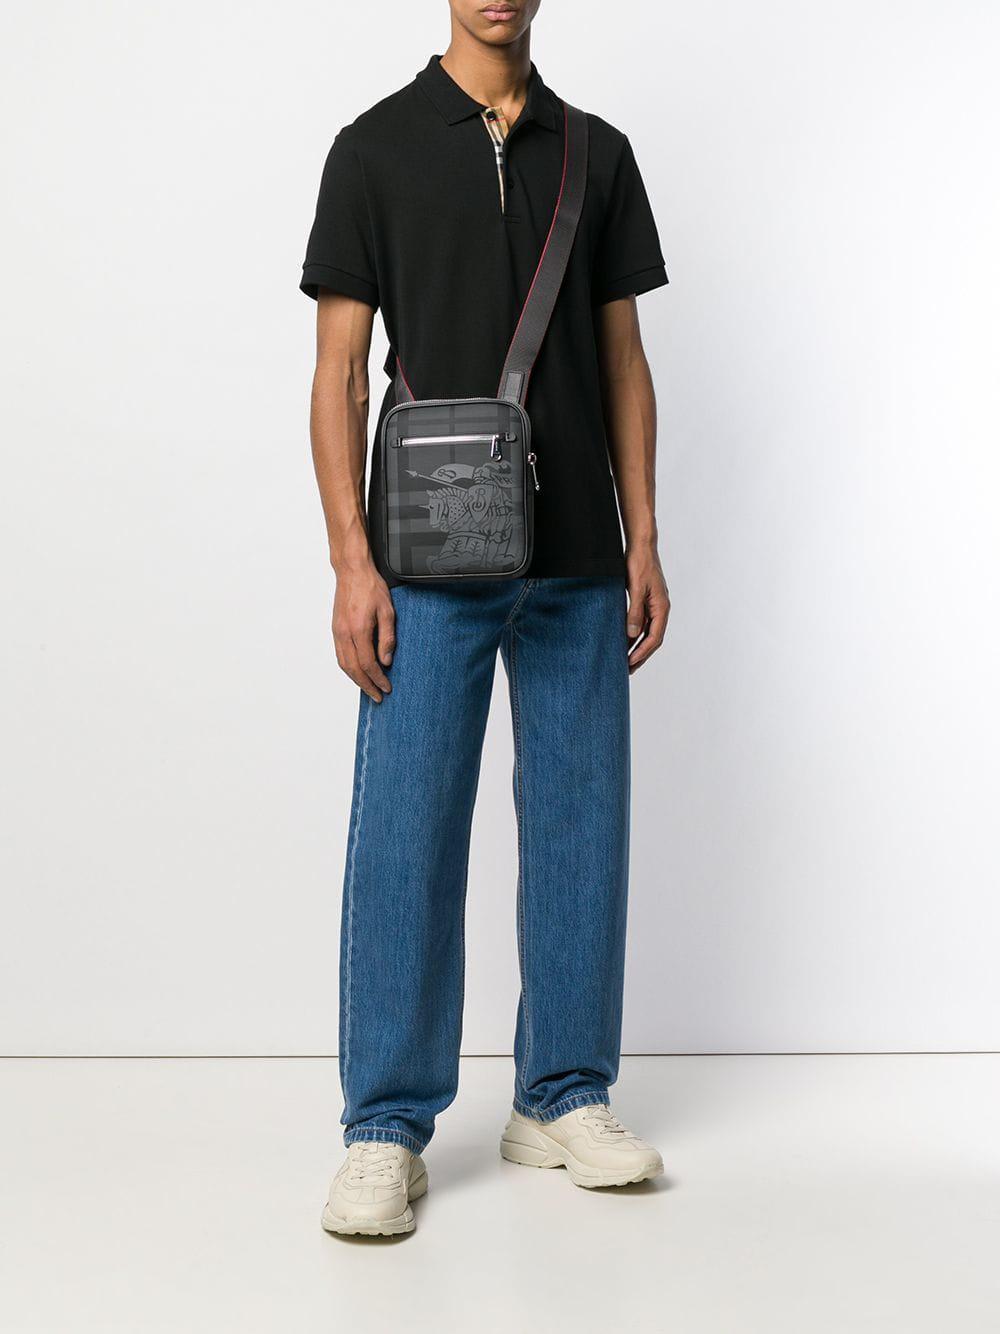 Lyst - Burberry Small Ekd London Check Crossbody Bag in Gray for Men 5512f4eb8ae7c